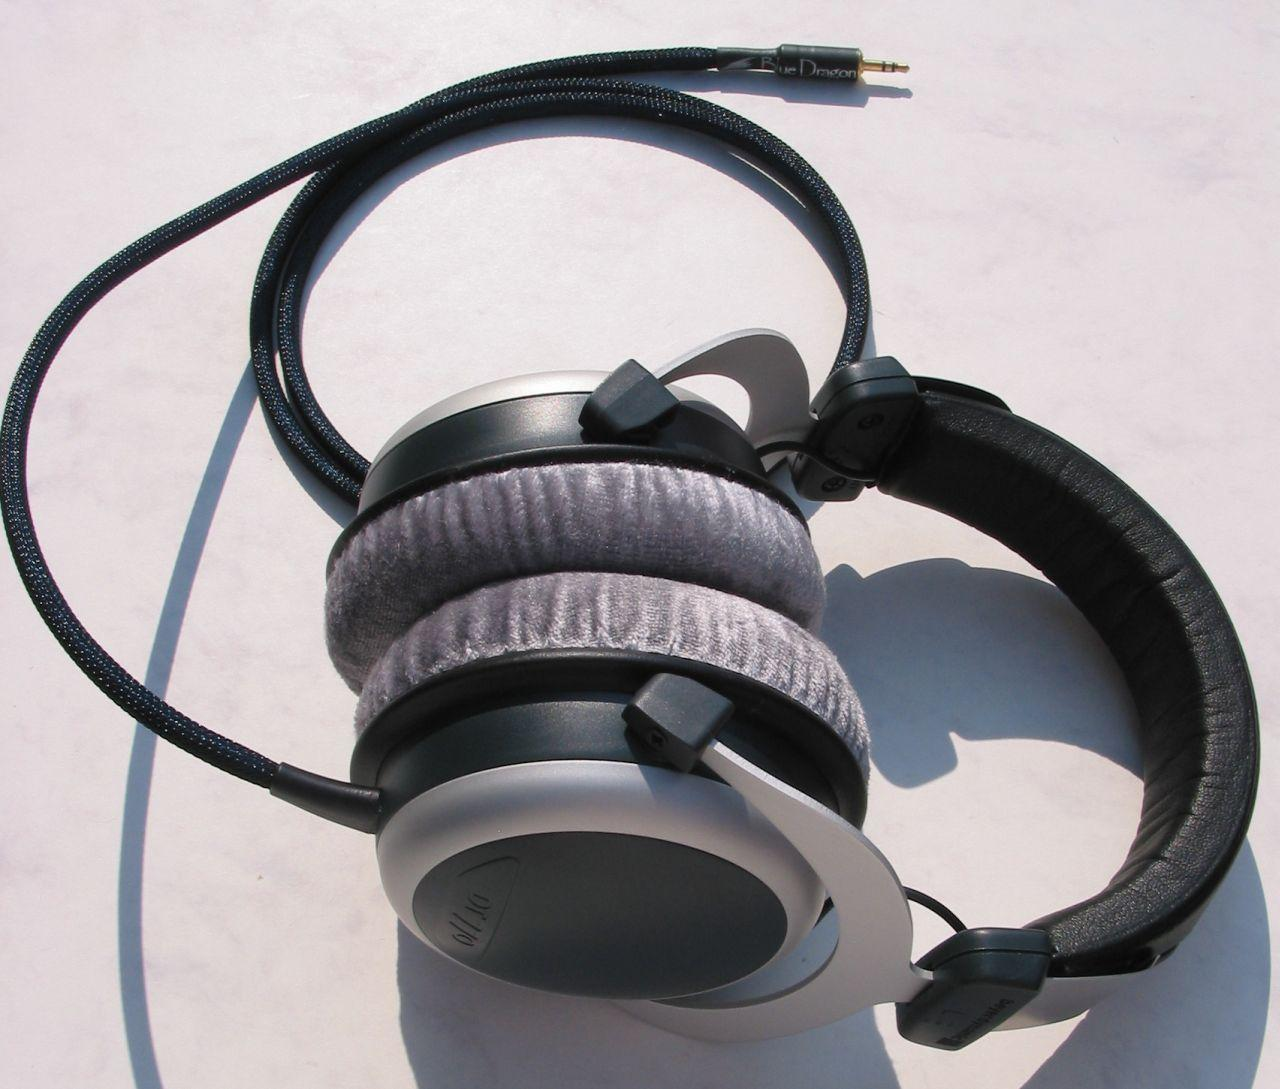 Beyerdynamic DT770 Blue Dragon V2 Headphone Cable